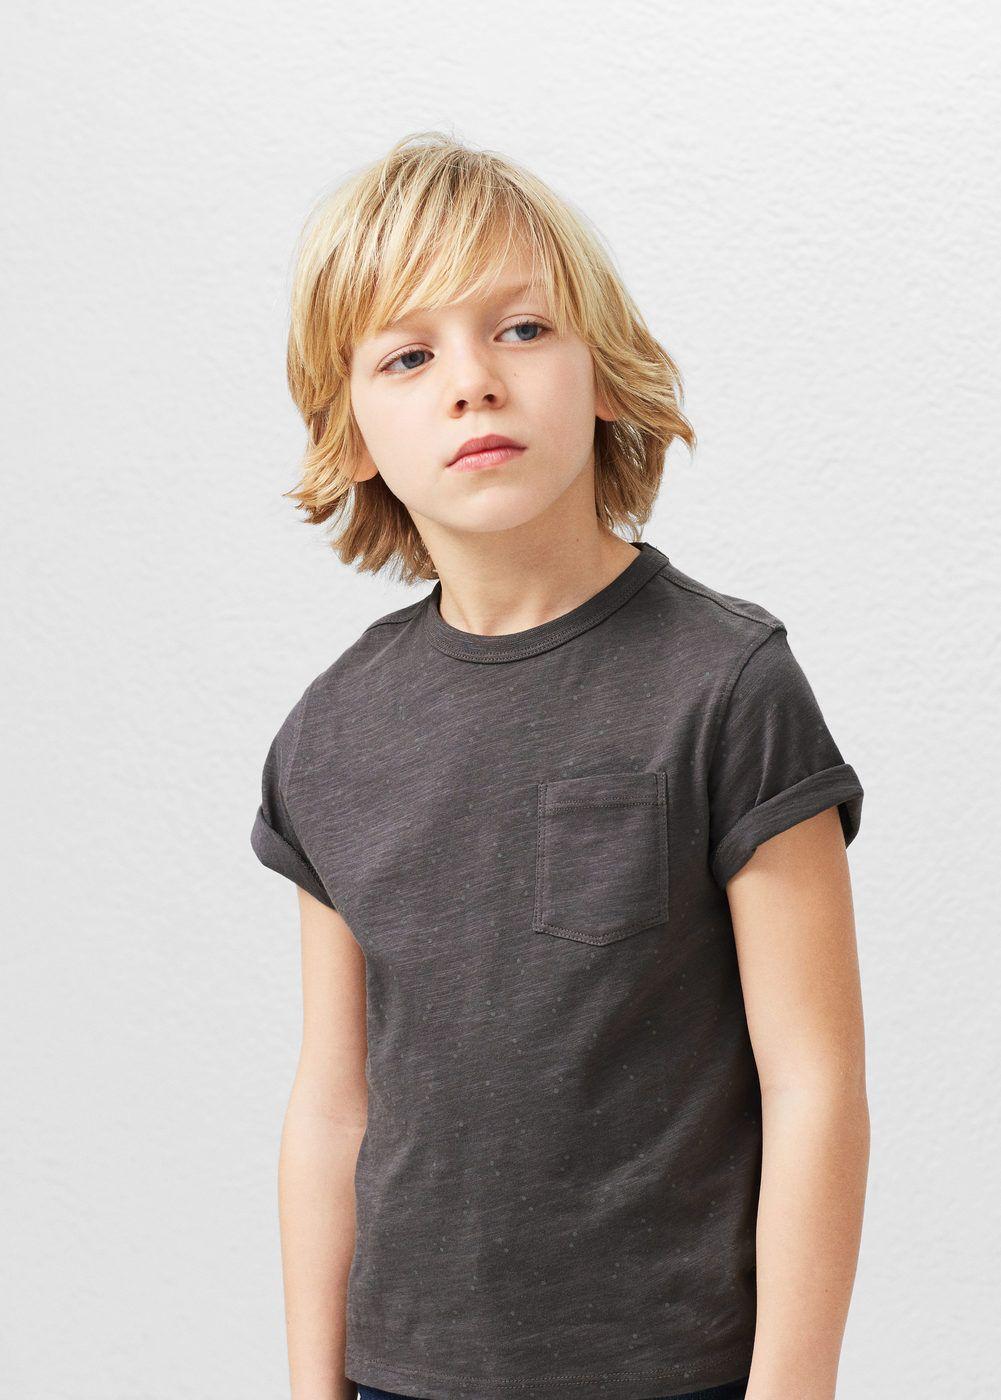 camiseta algod n bolsillo ni o children character inspiration pinterest. Black Bedroom Furniture Sets. Home Design Ideas